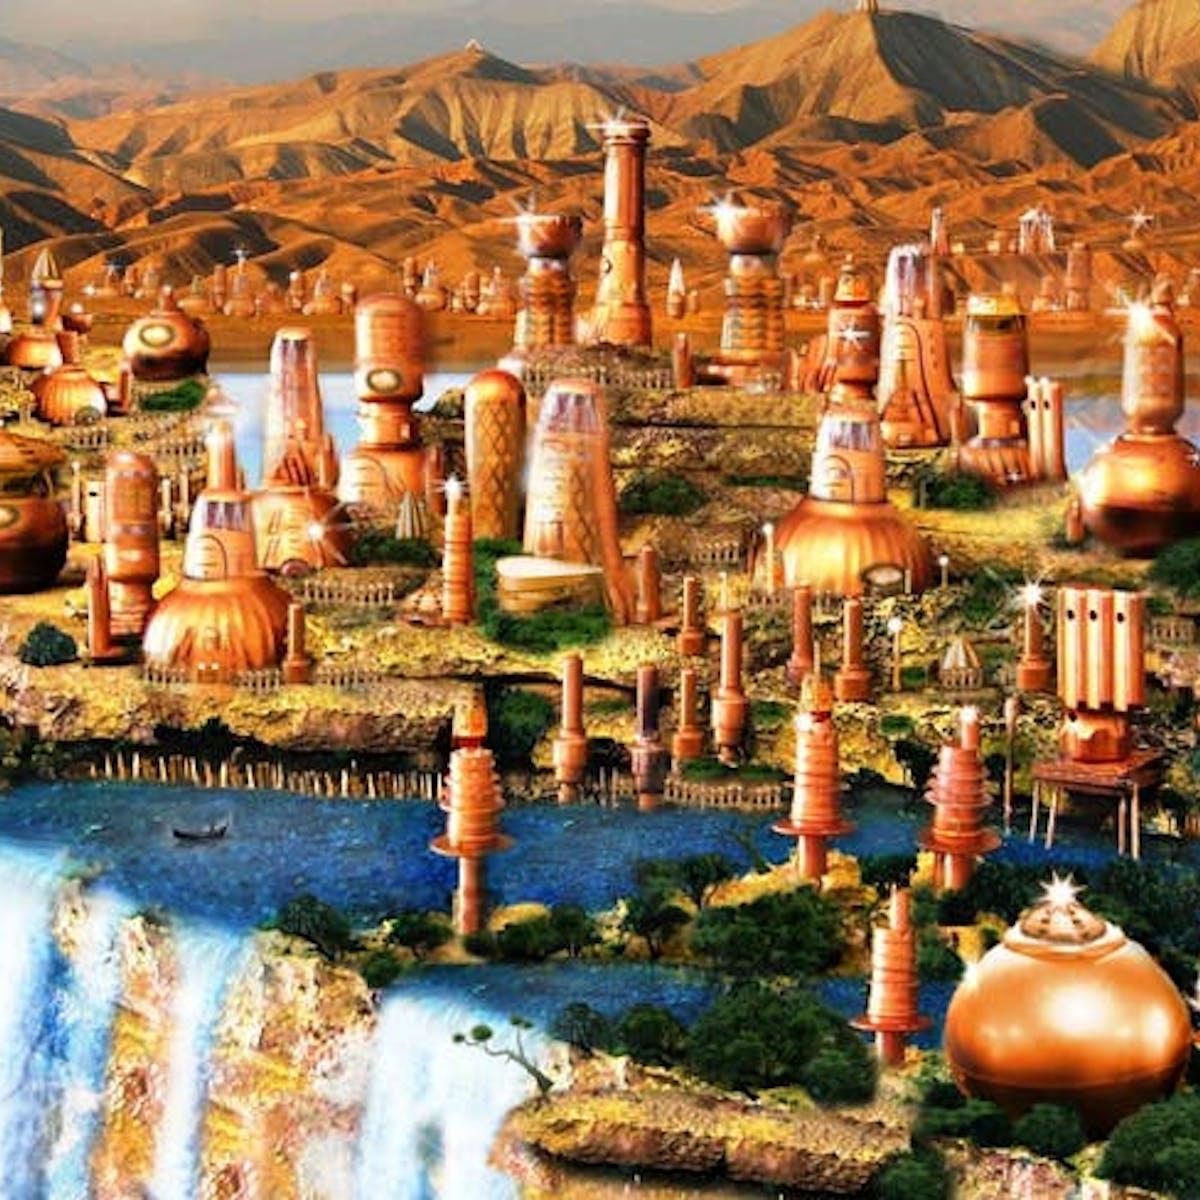 Menggunakan Karya Sastra Untuk Meramalkan Perkotaan Masa Depan